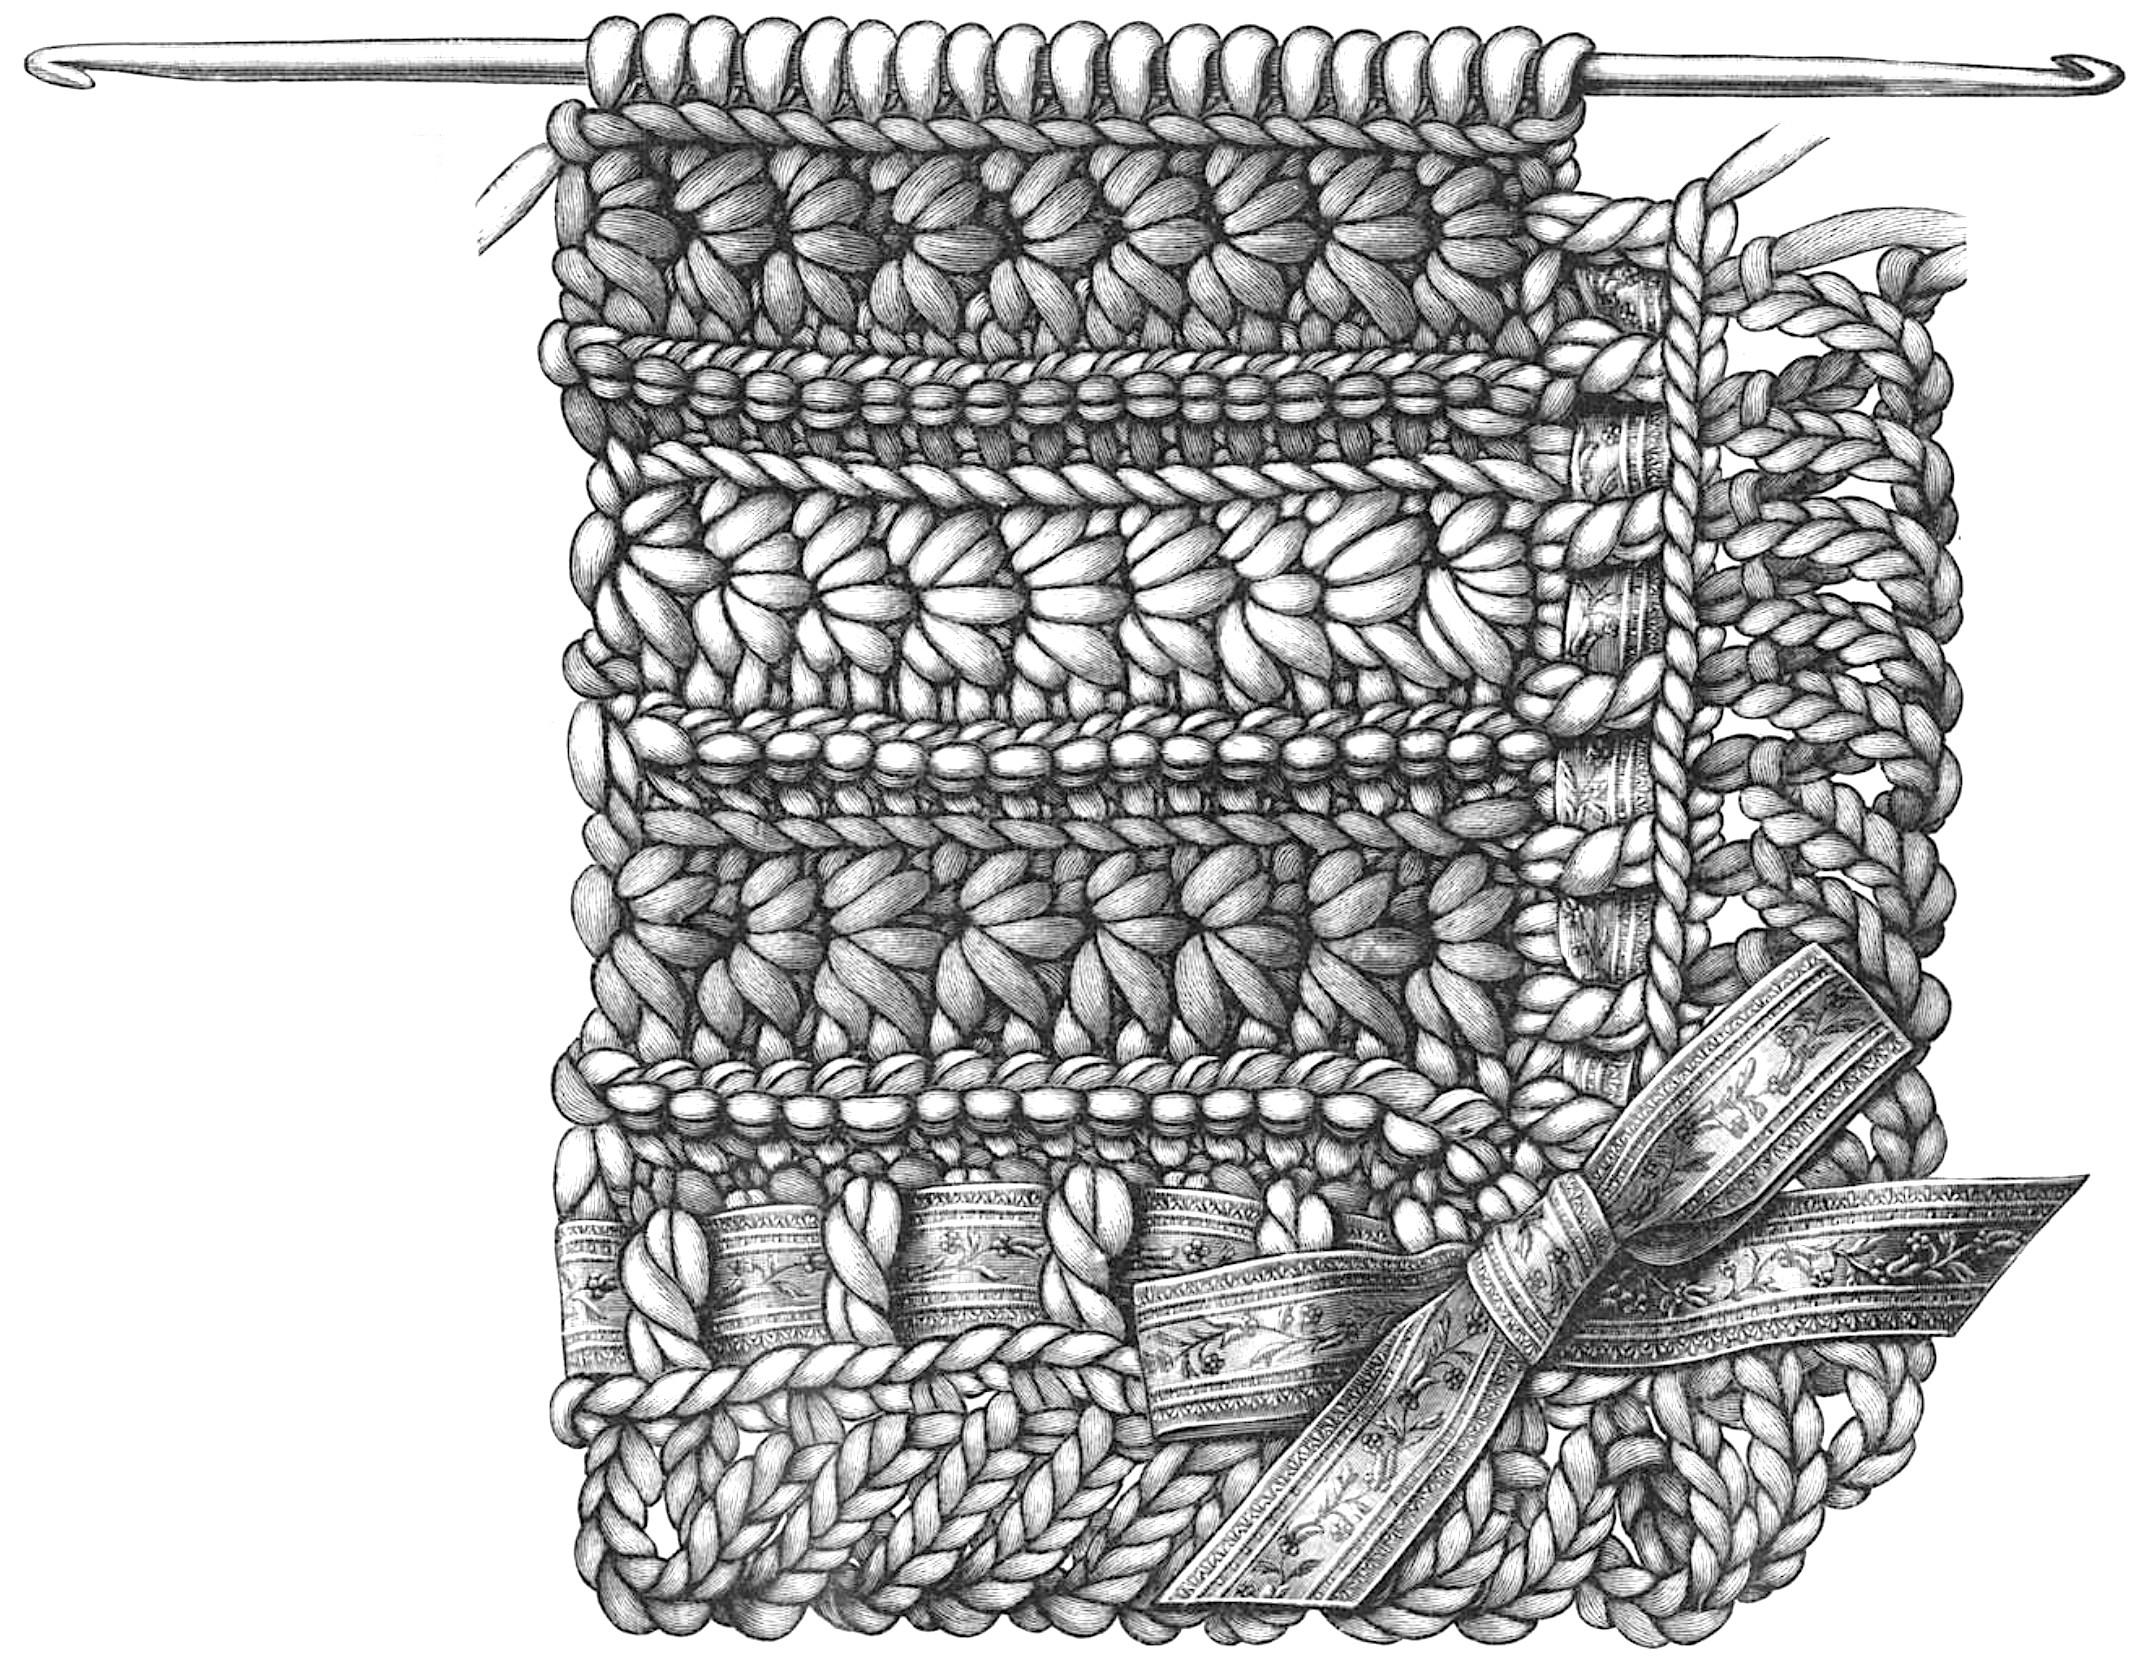 bazar-two-end-hook-1896